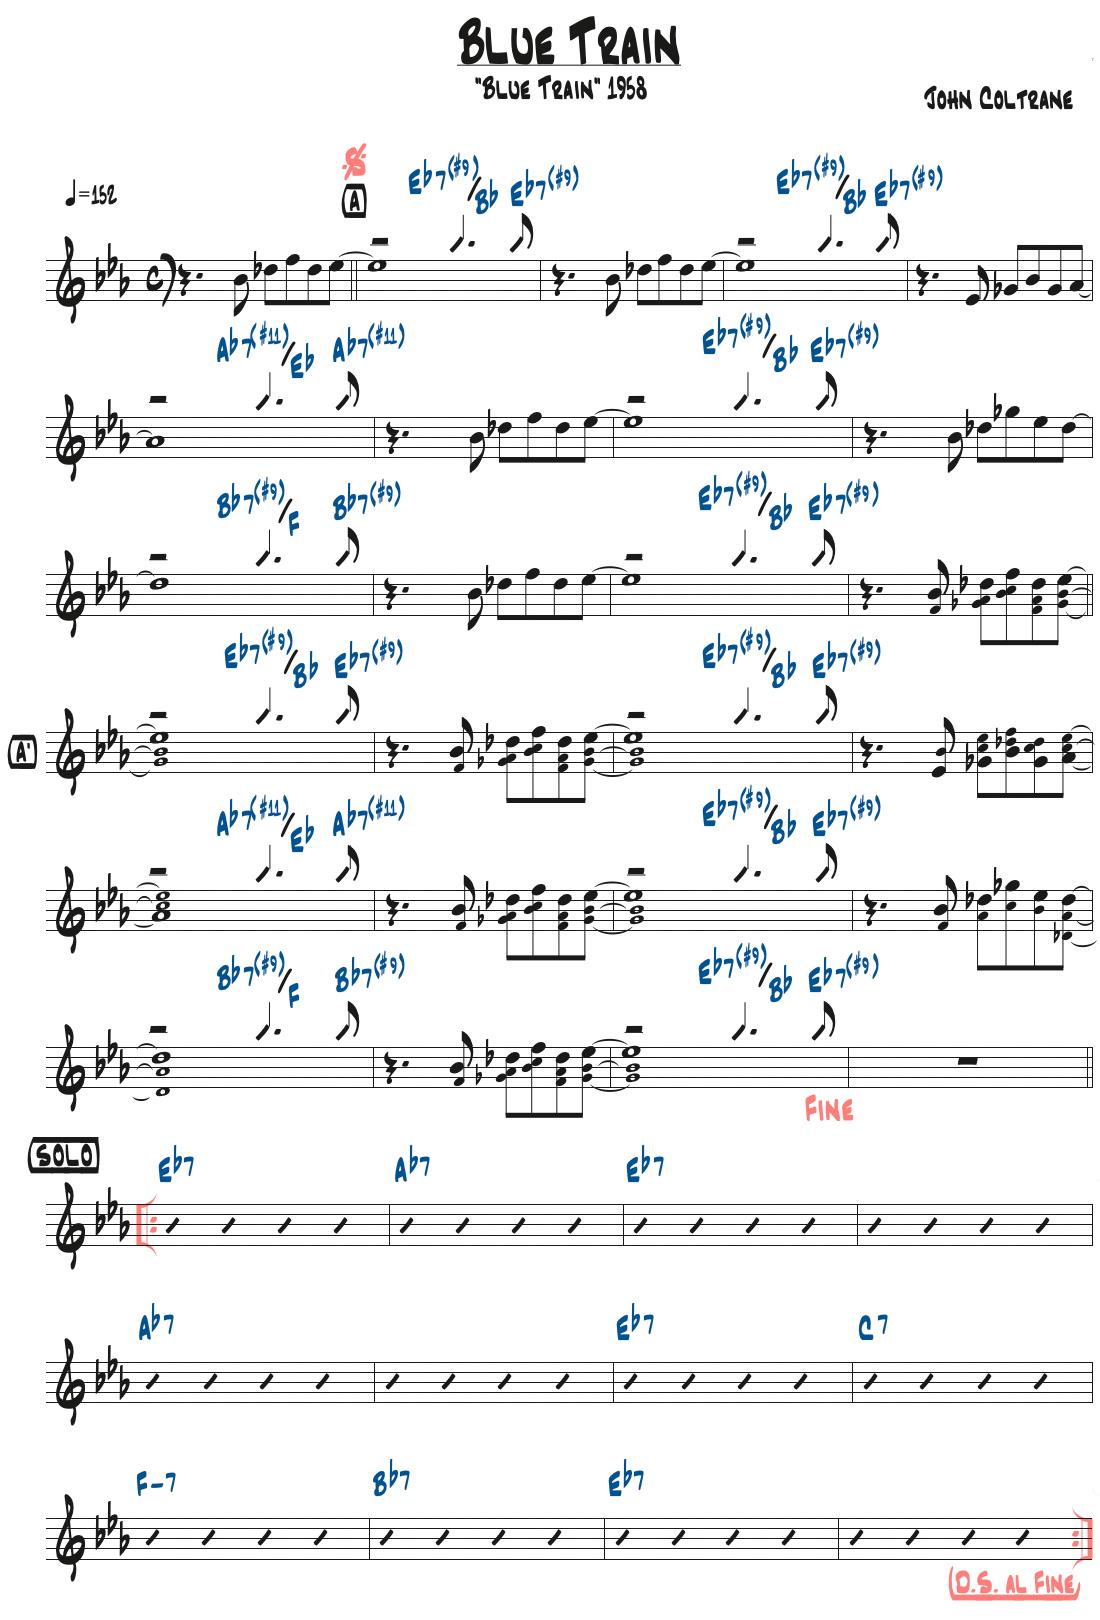 John Coltrane作曲『Blue Train』のリードシート